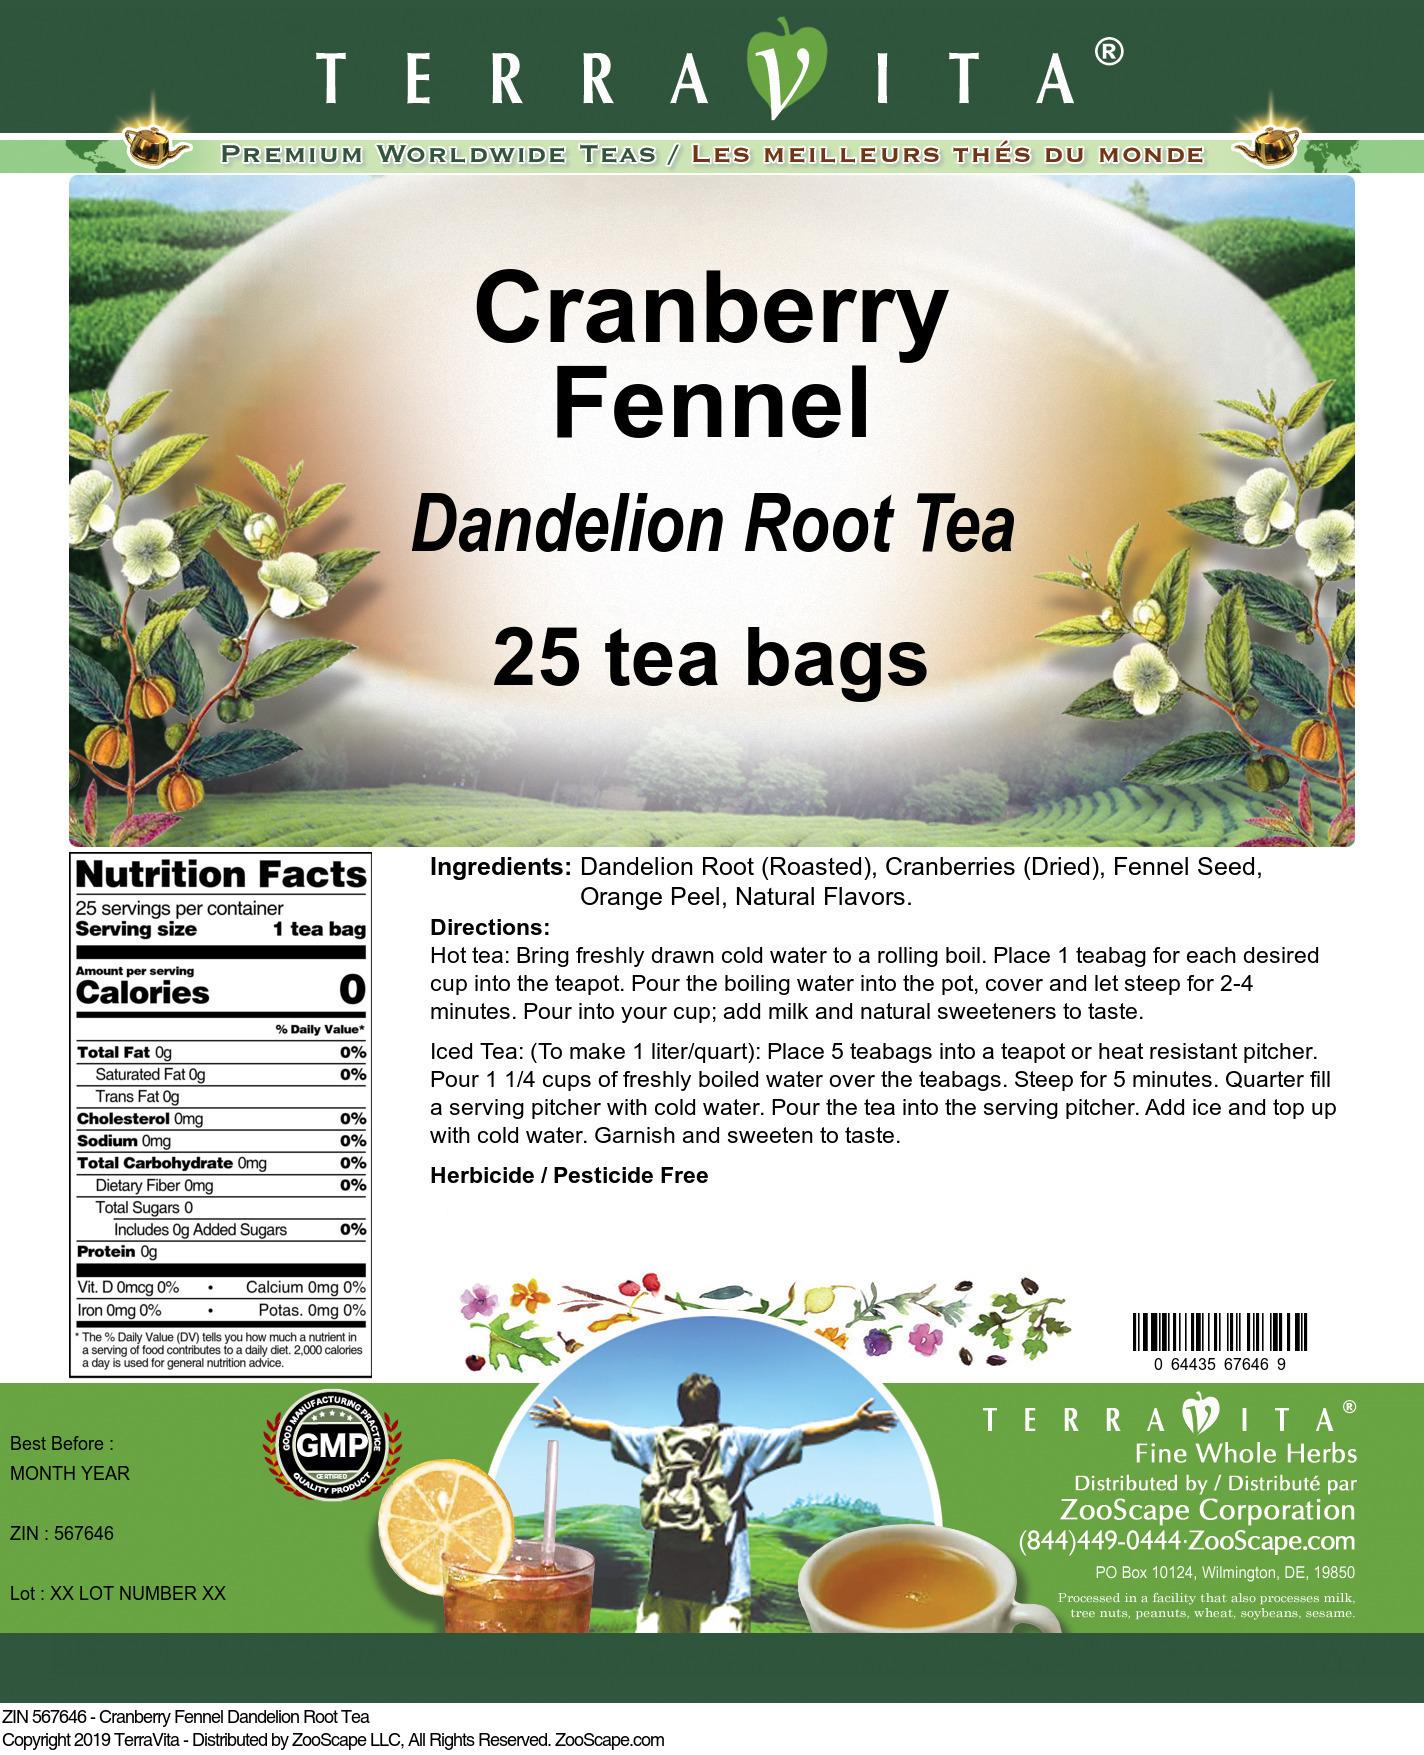 Cranberry Fennel Dandelion Root Tea